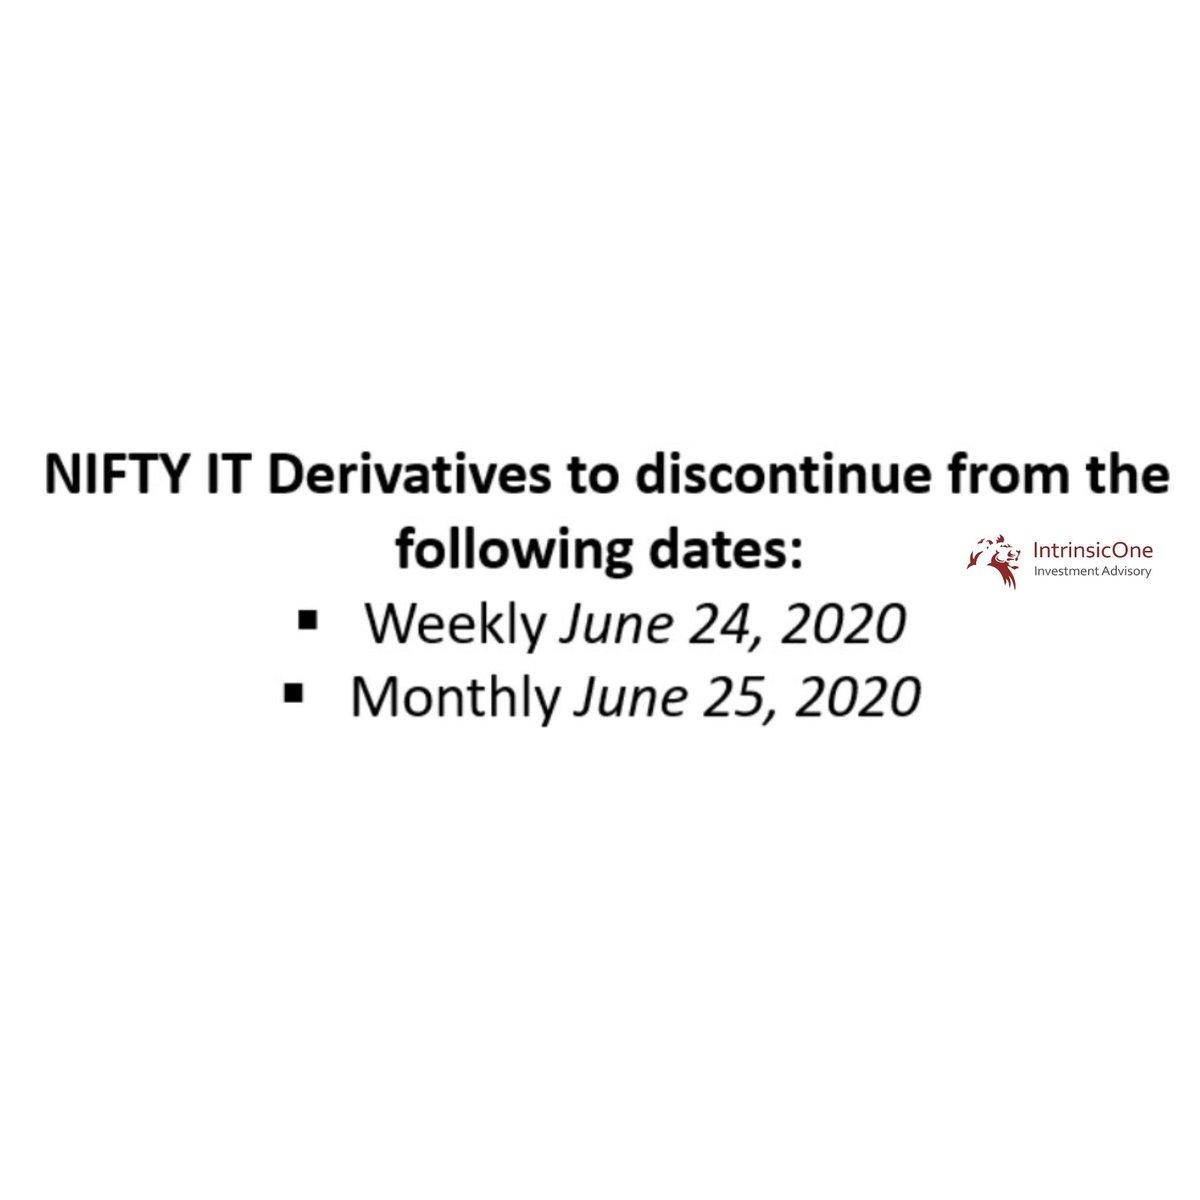 #Sebi #nifty50 #Latestnews #Markets #sensex #stocks #TrendingNow #India #coronavirus